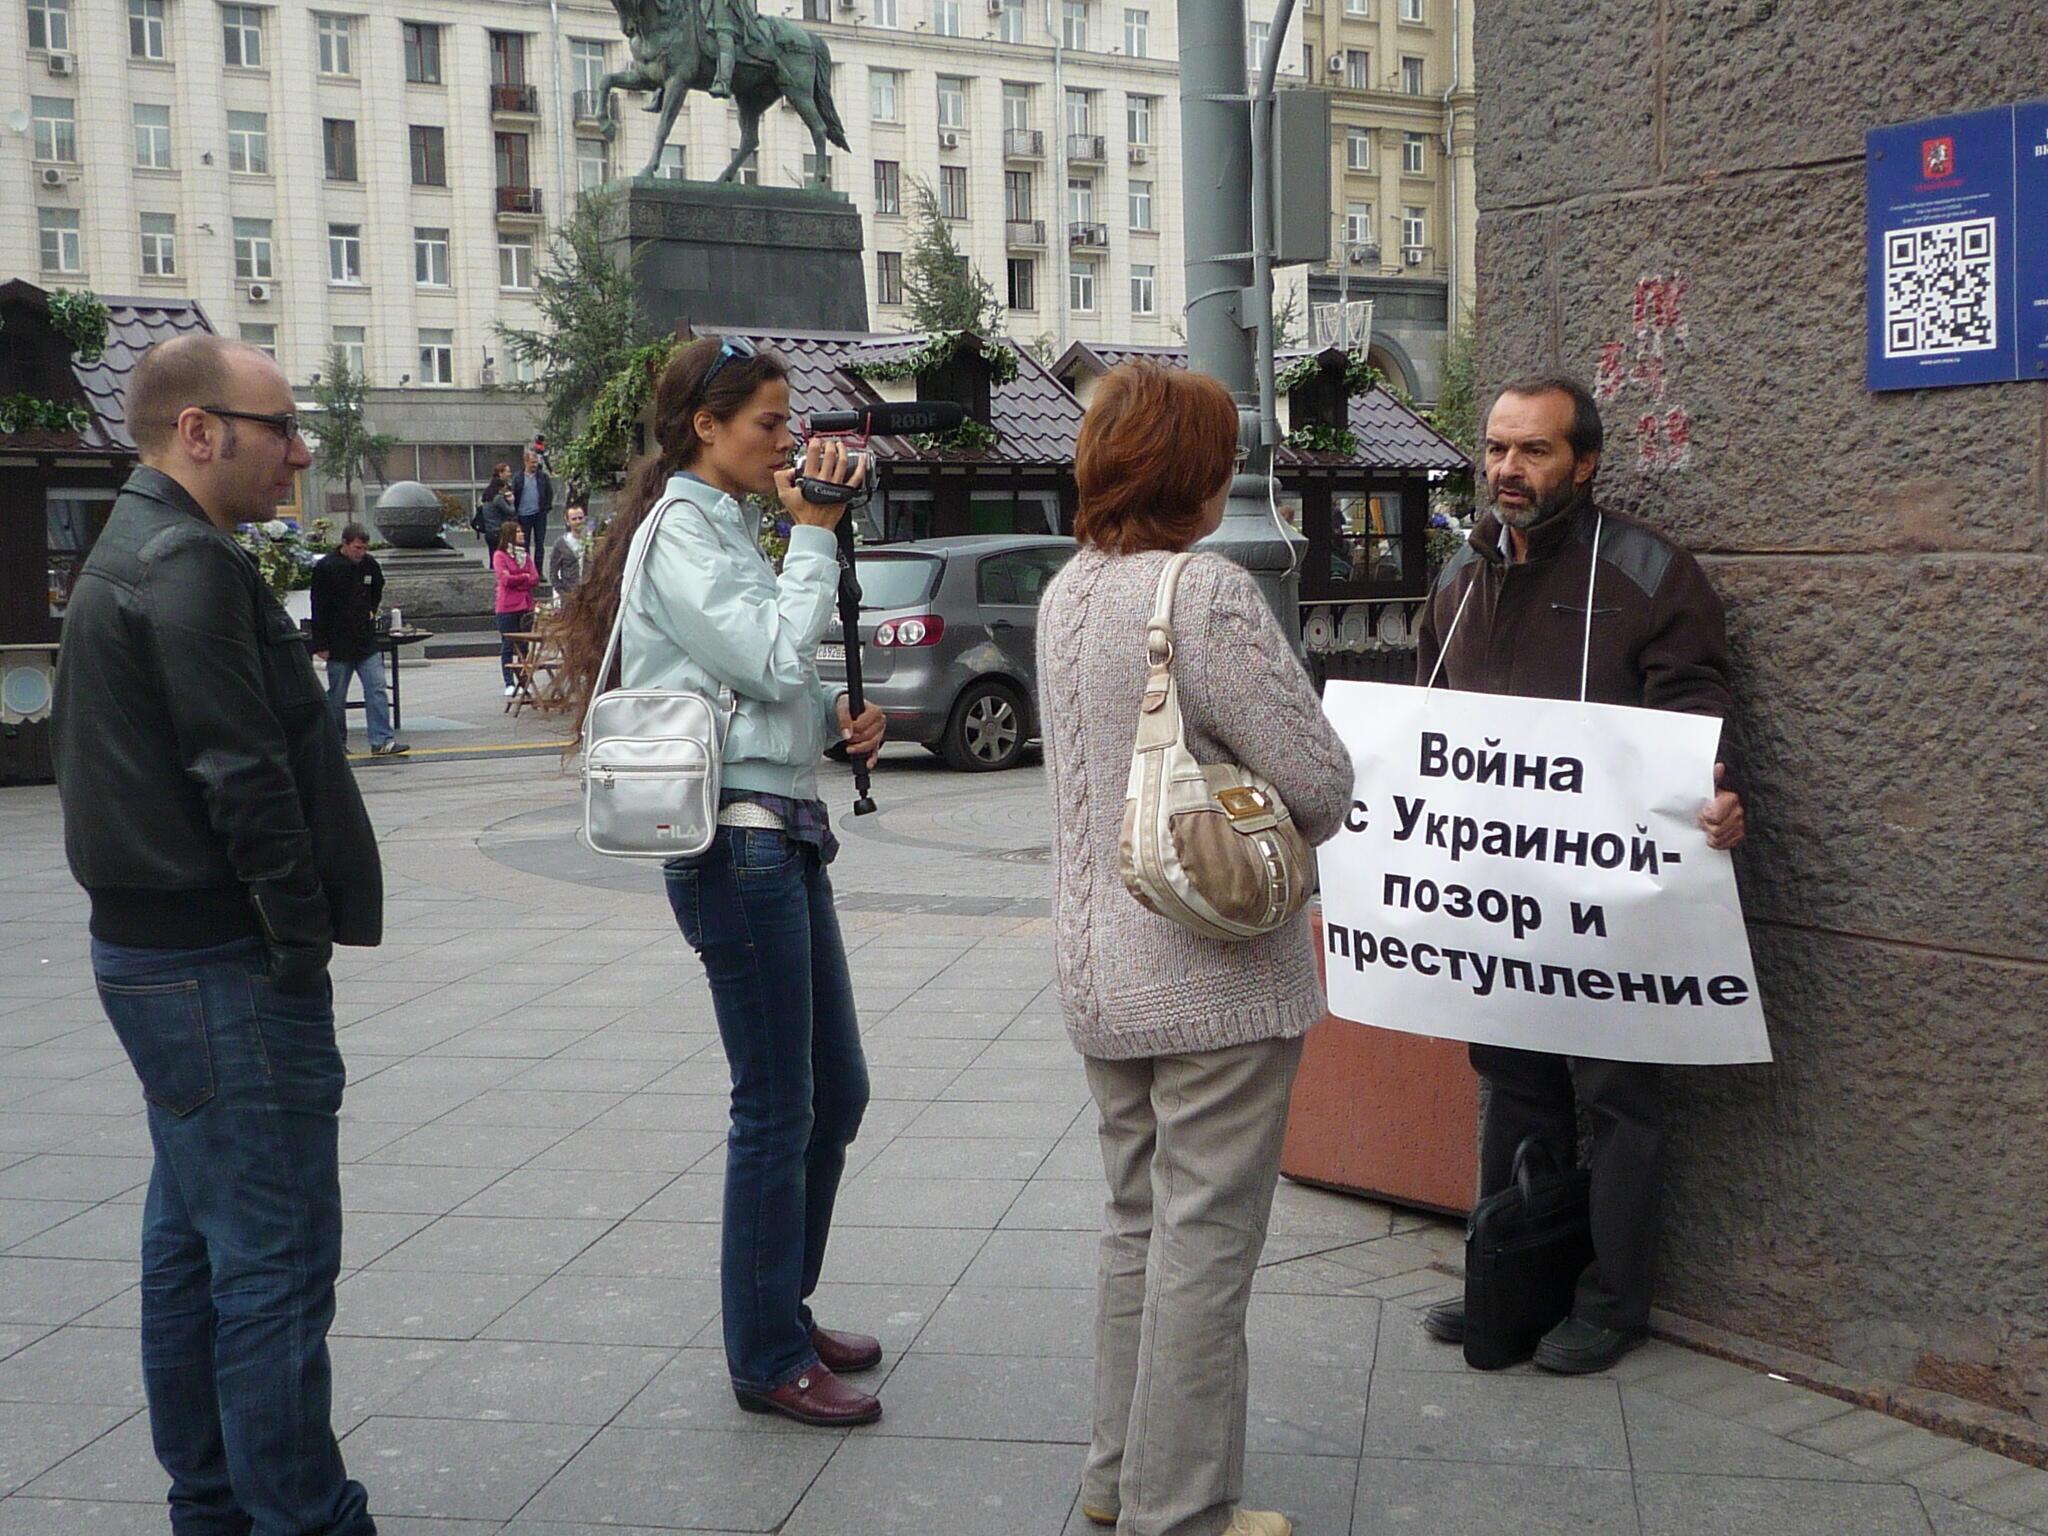 Пикет Виктора Шендеровича, Москва, 31 августа 2014 года